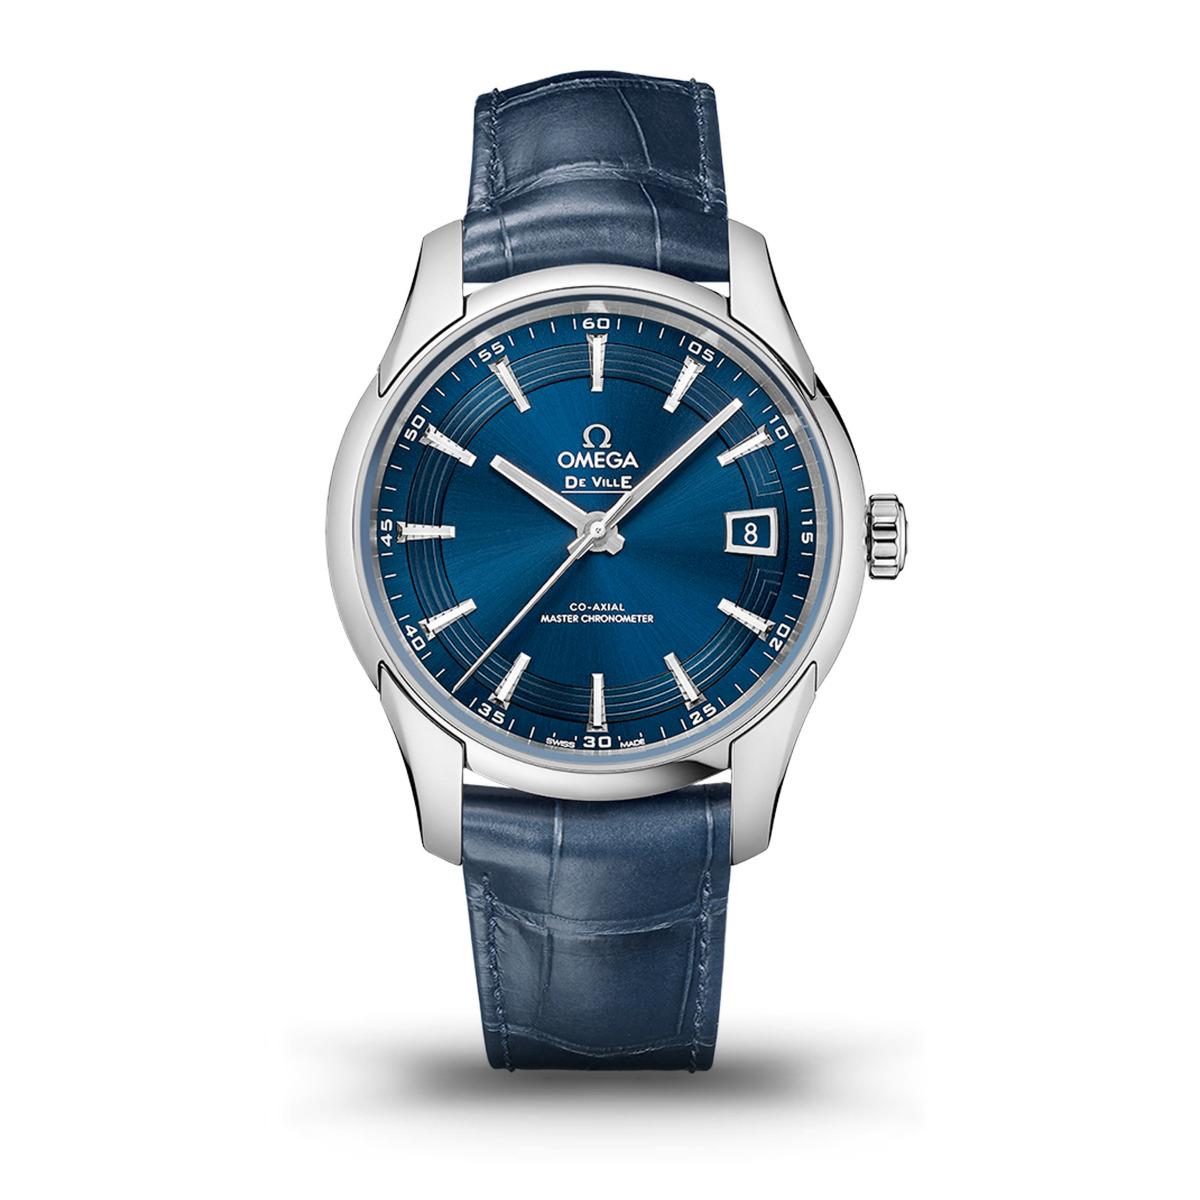 Gents OMEGA De Ville Hour Vision 'Orbis' Watch